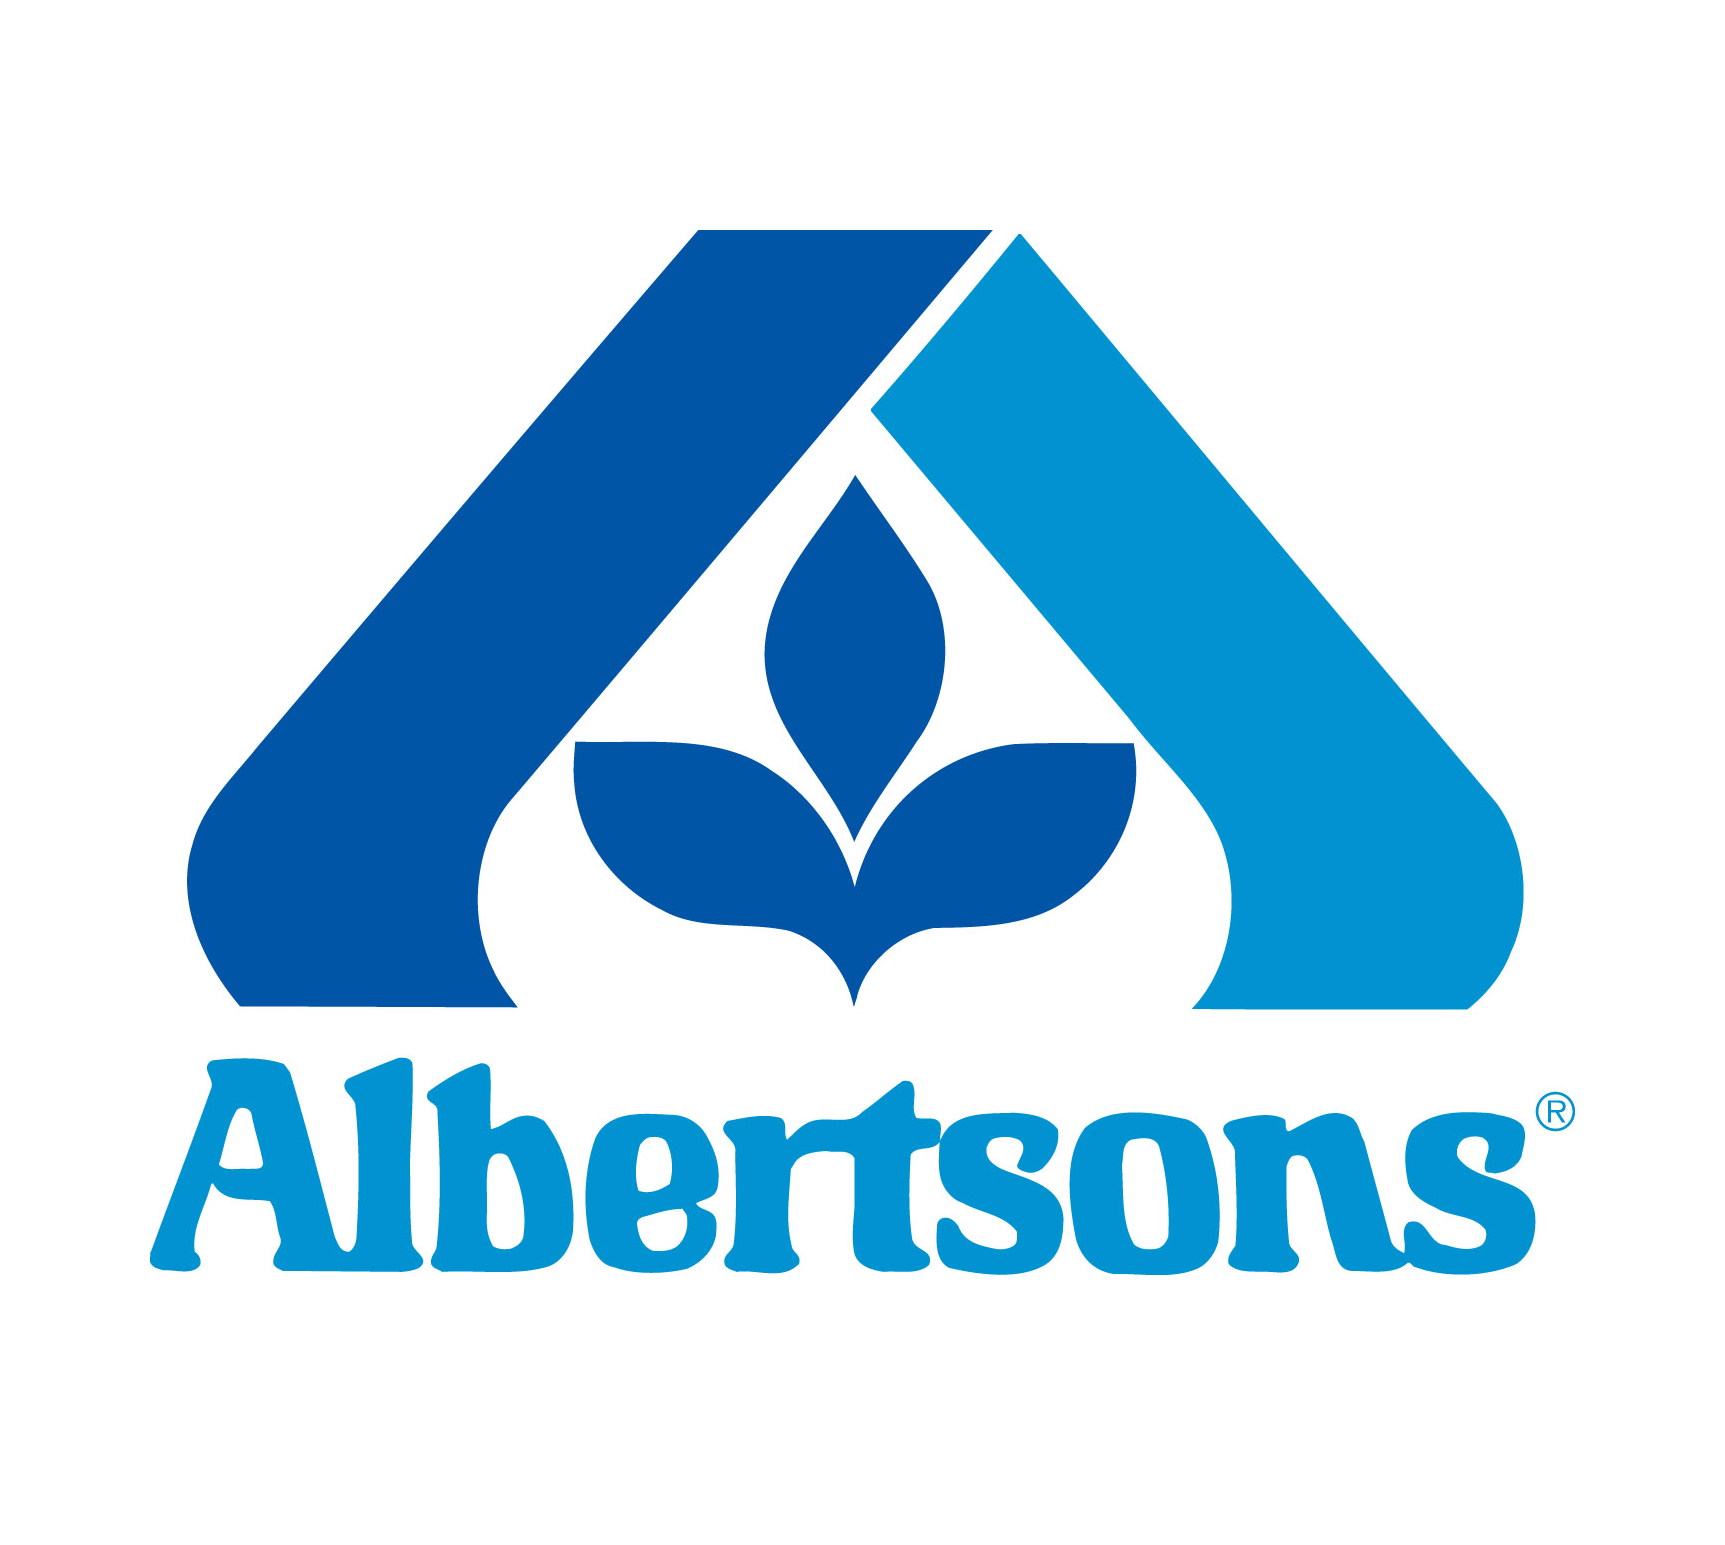 My Albertsons Logo